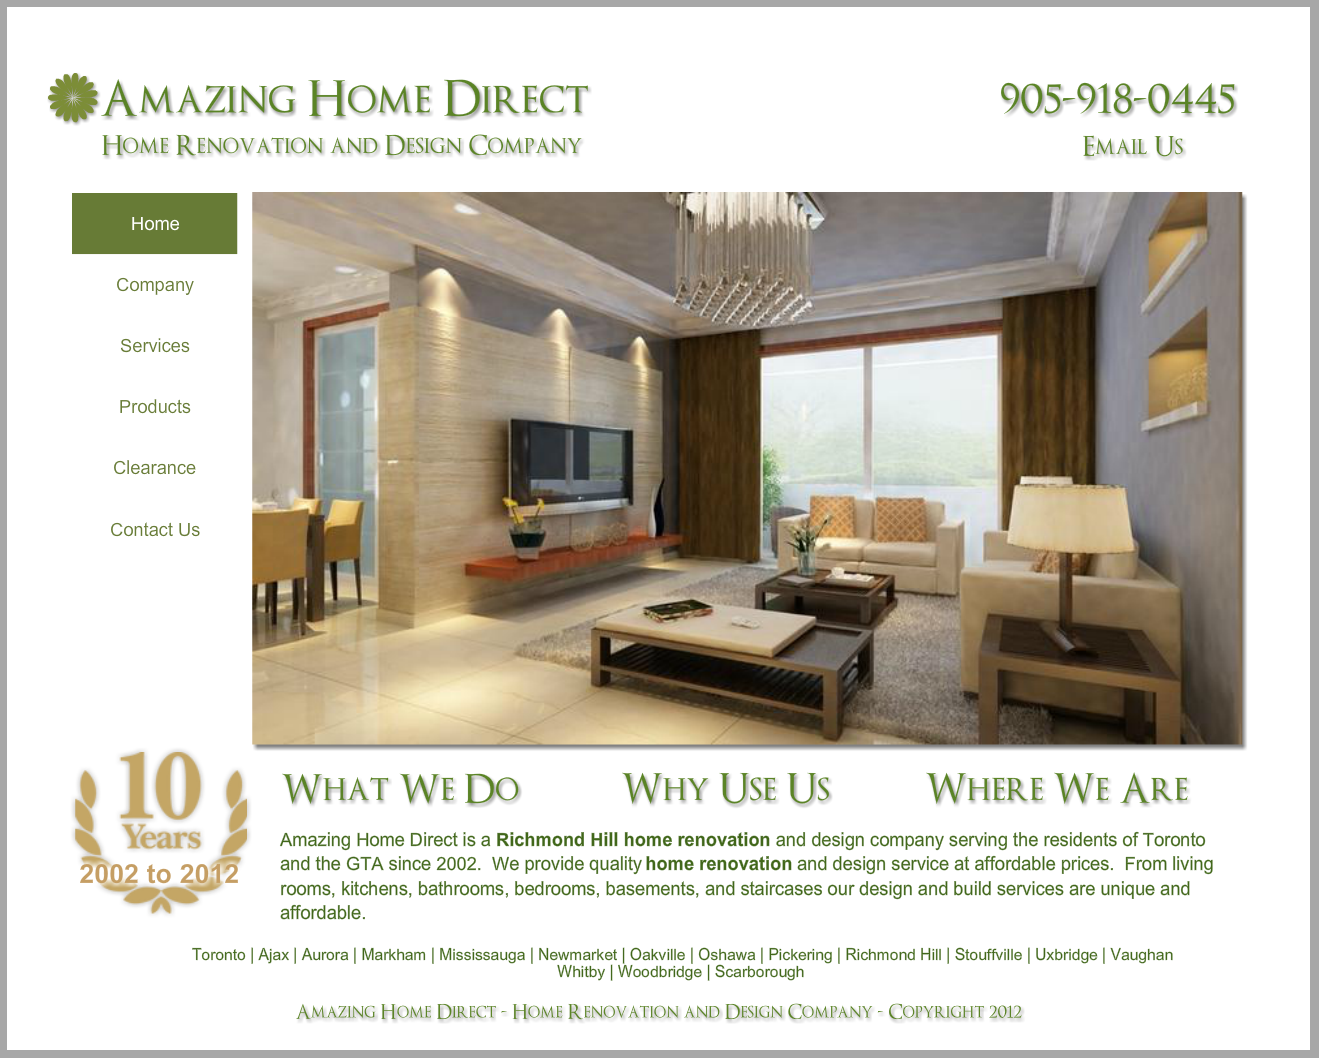 Amazing Home Direct